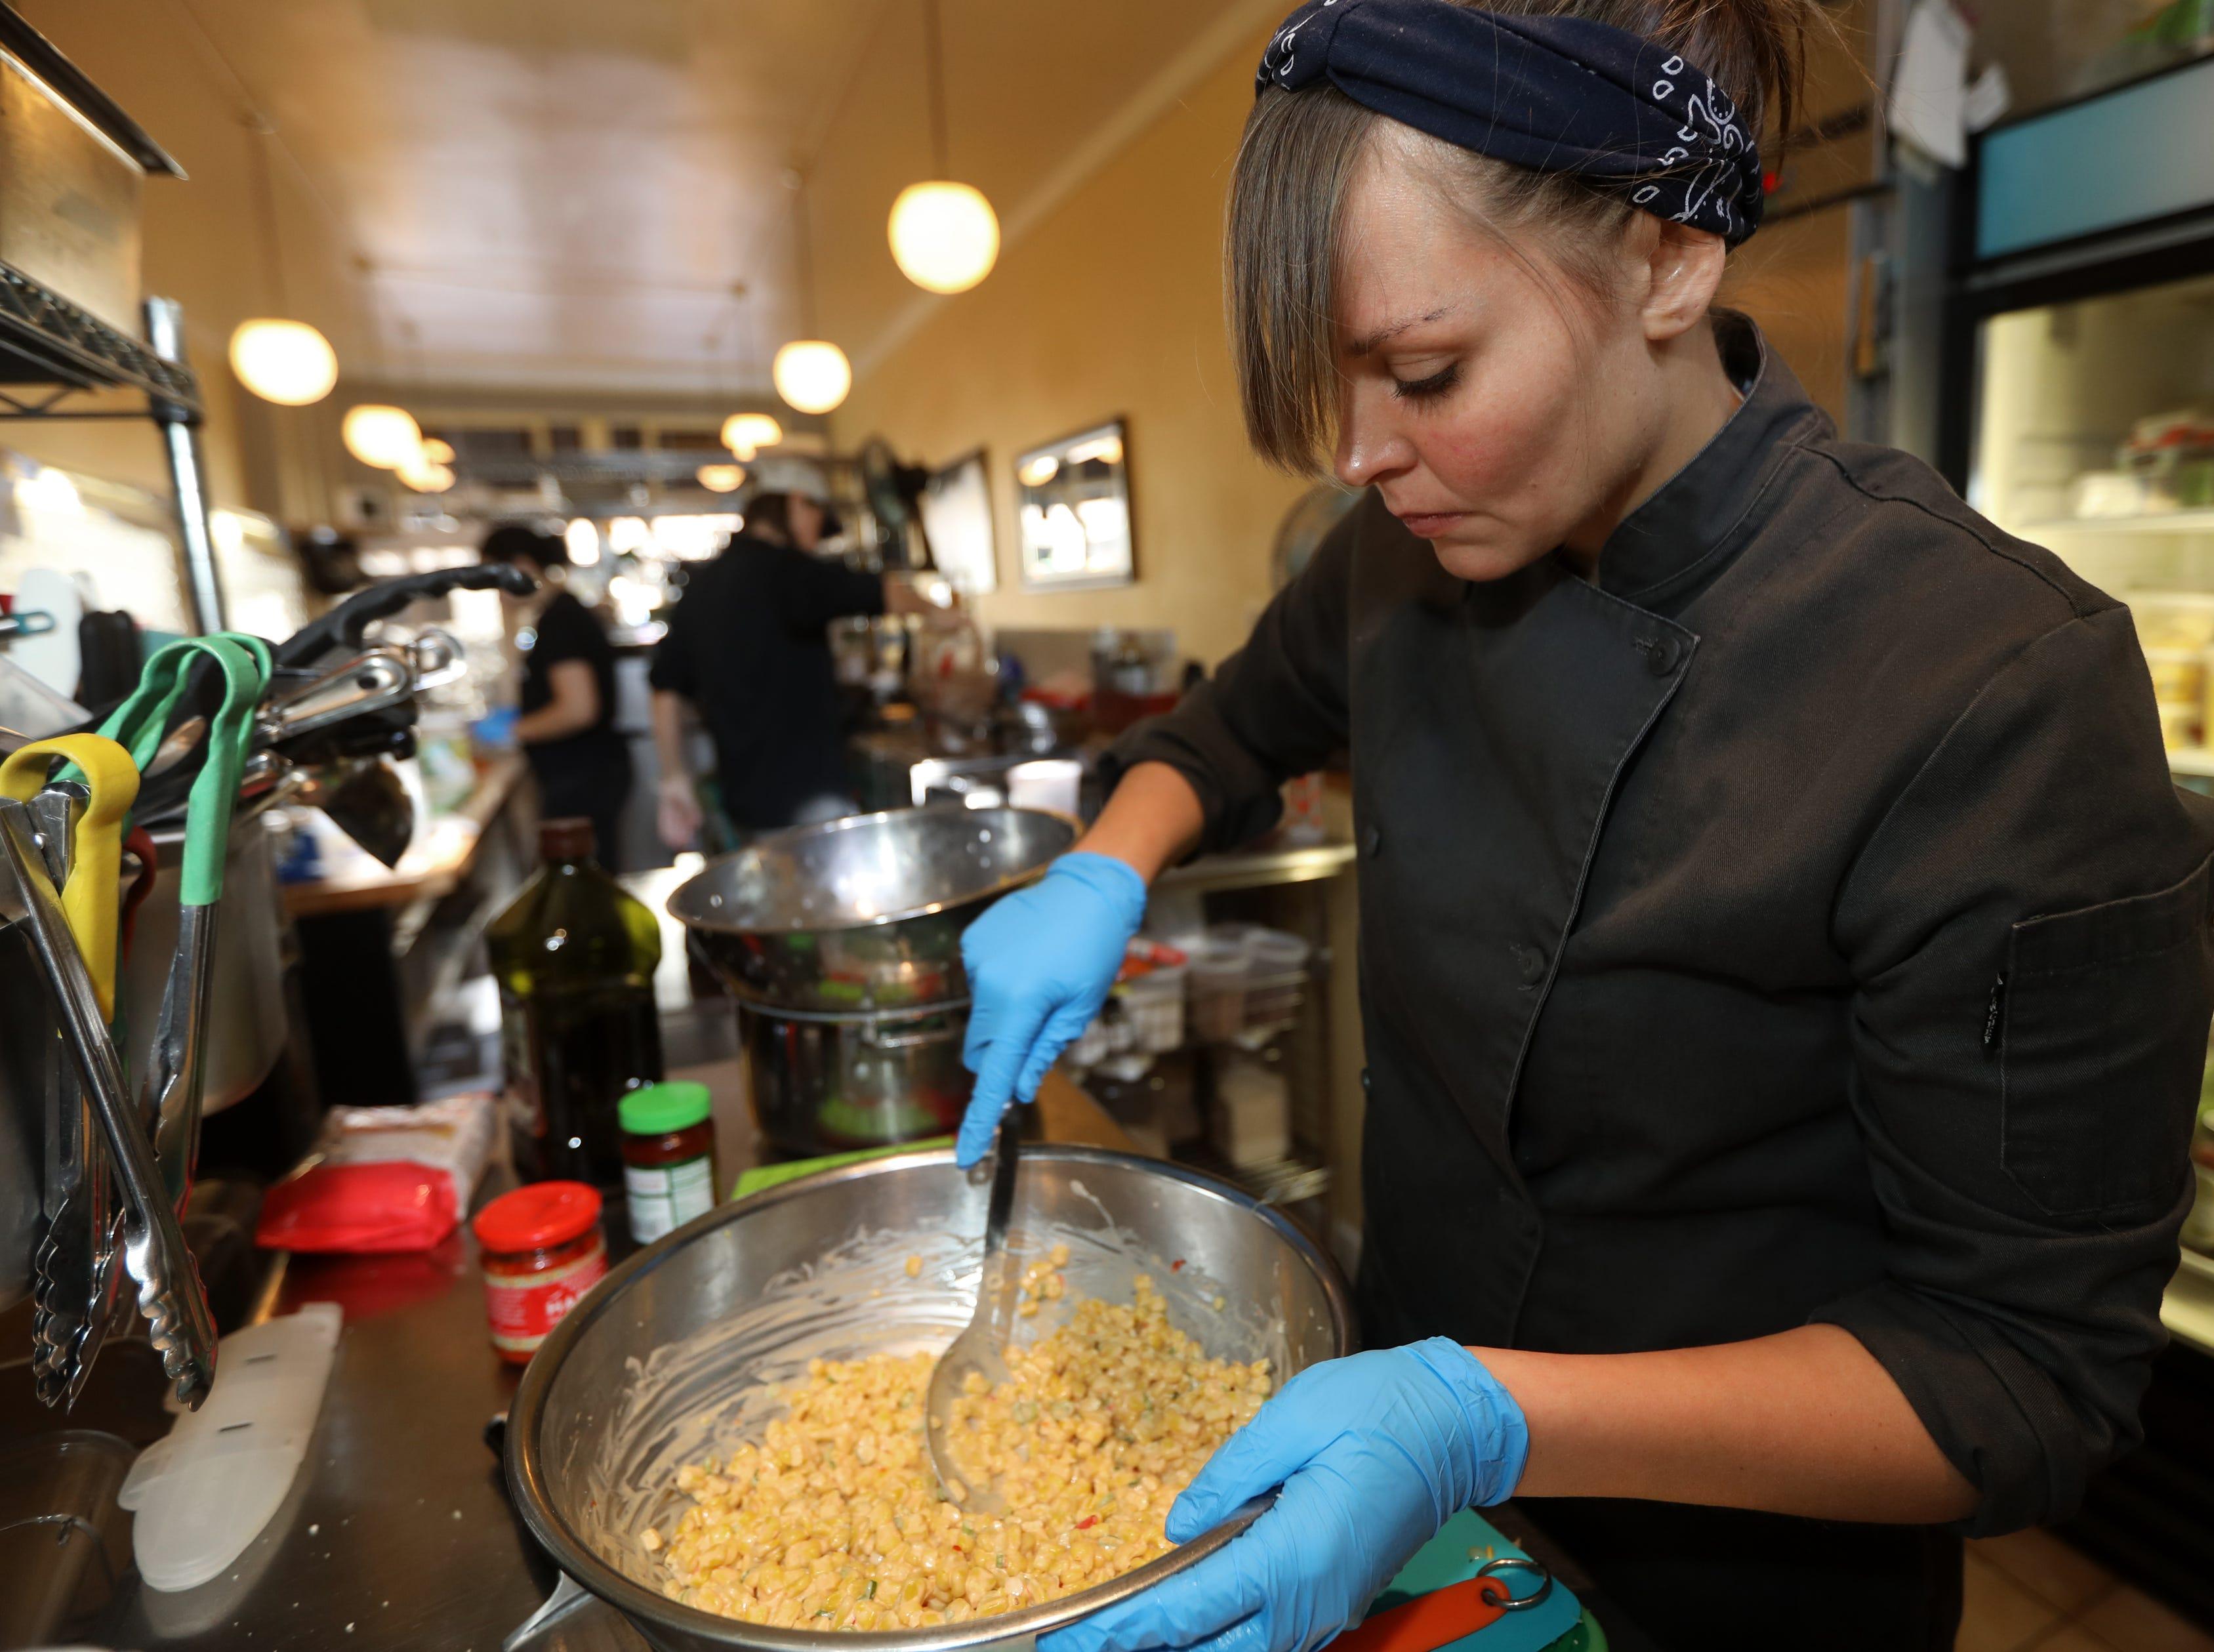 Sally Owens prepares spicy corn for her vegan gunkan maki.